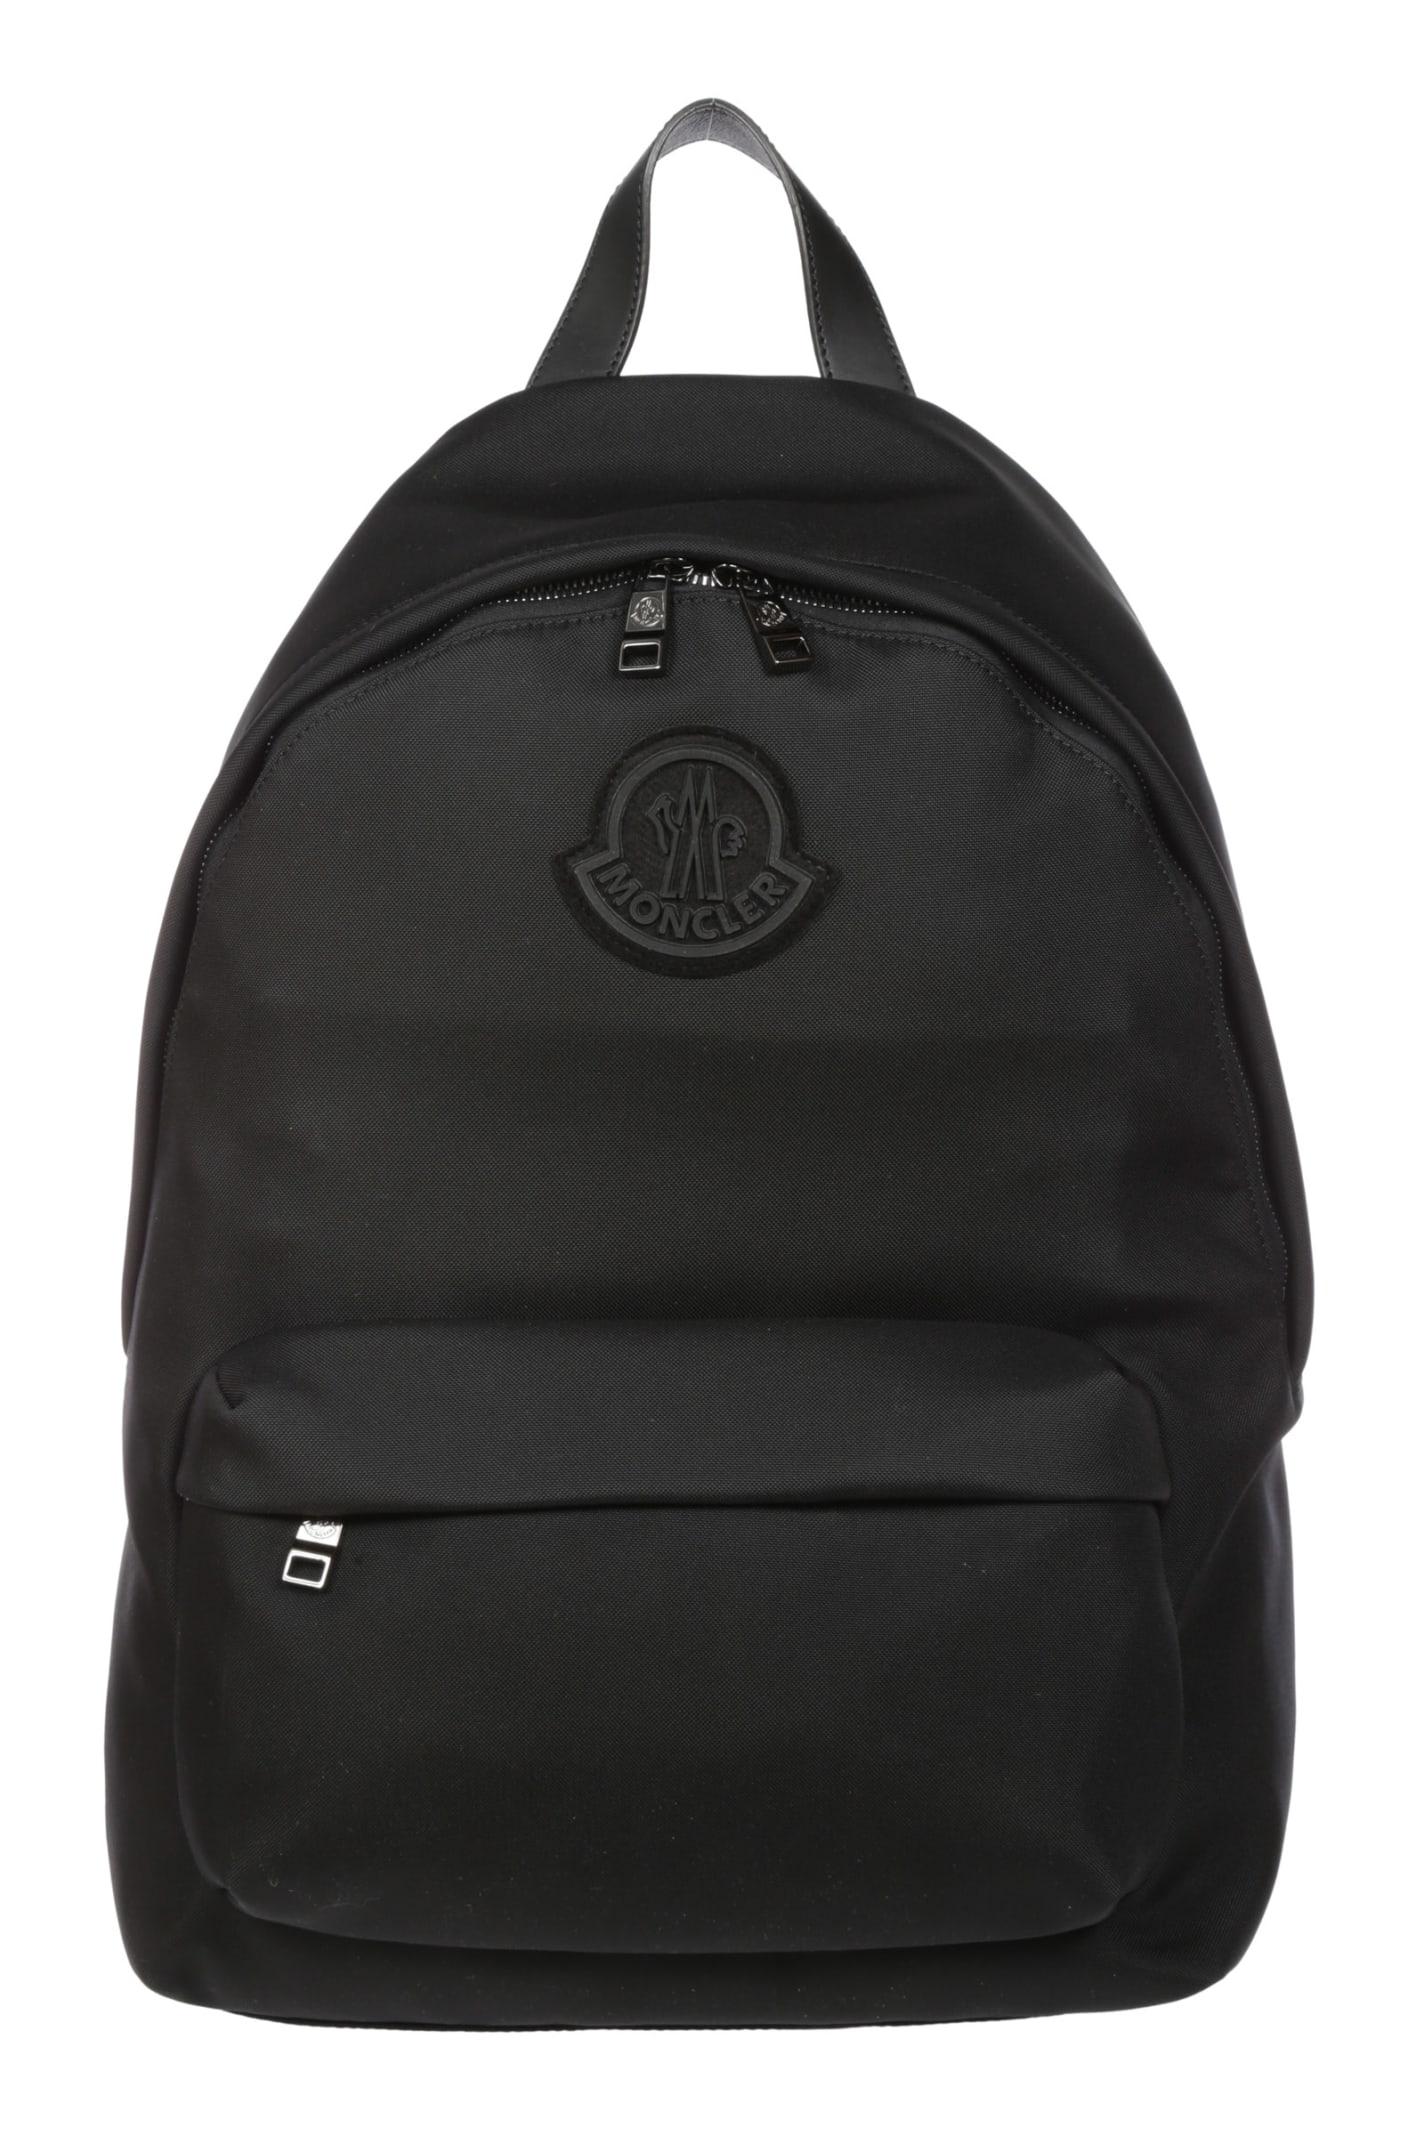 Moncler Pierrick Backpack